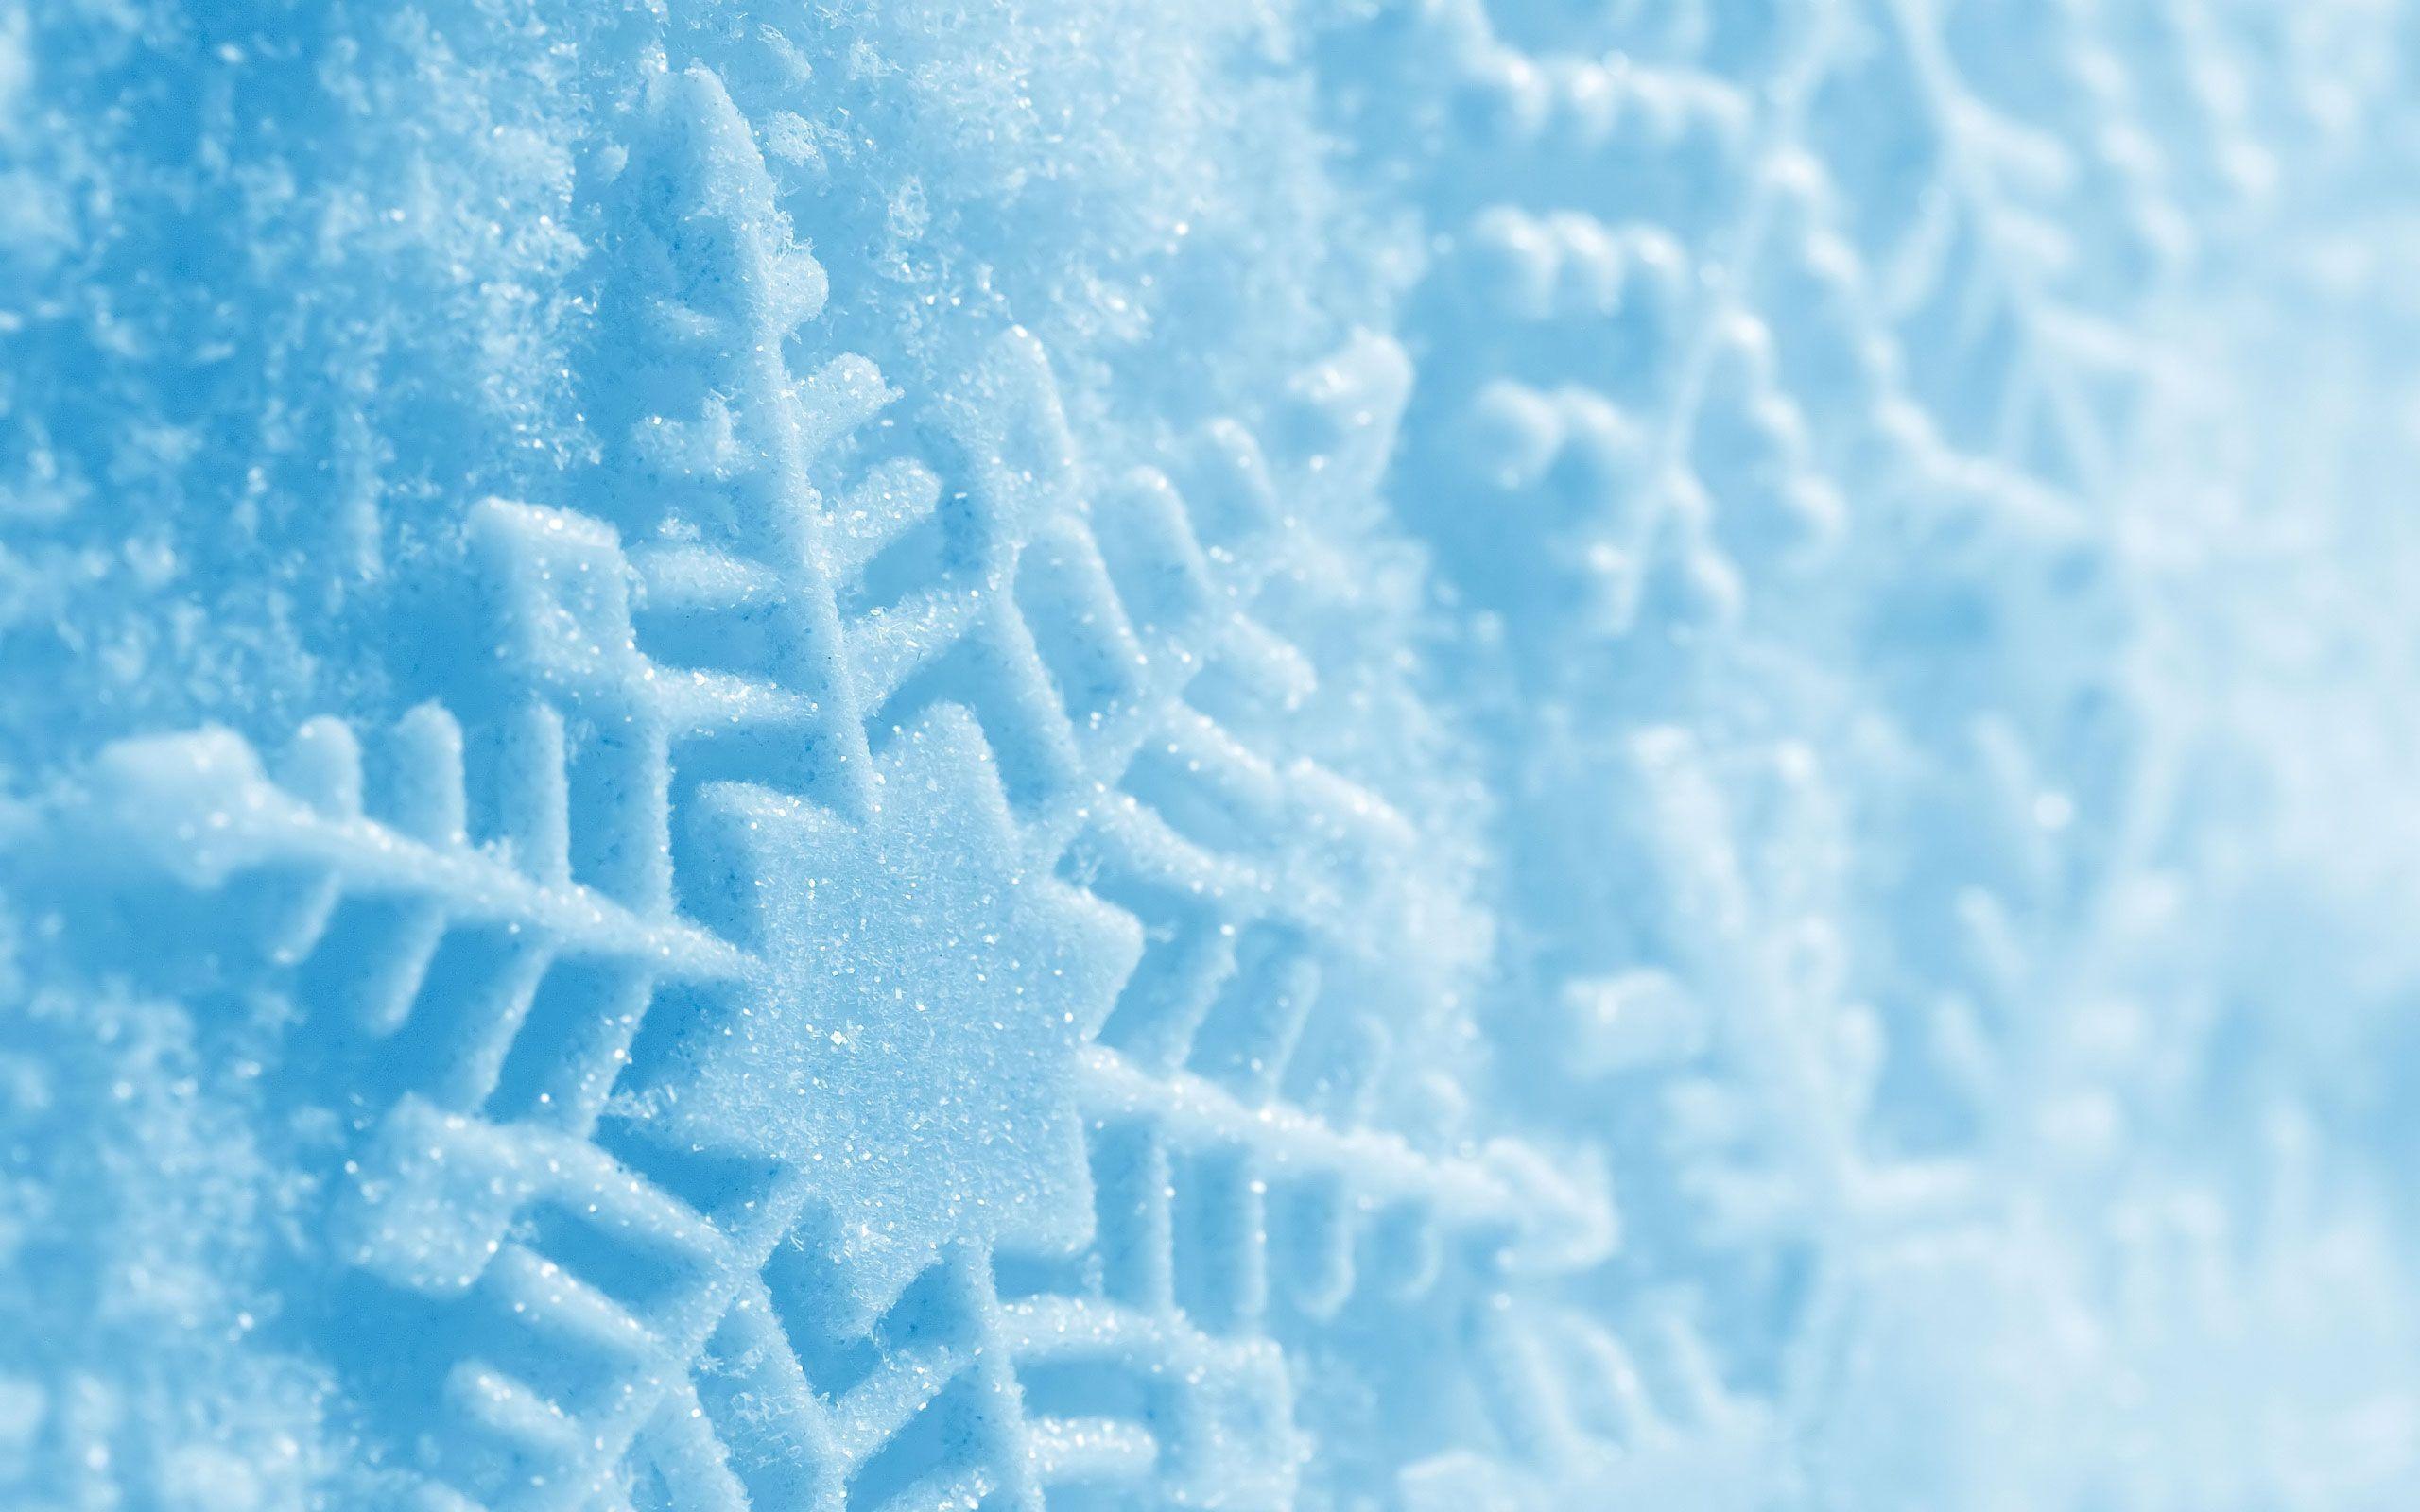 Snow Background 7 Backgrounds | Wallruru.